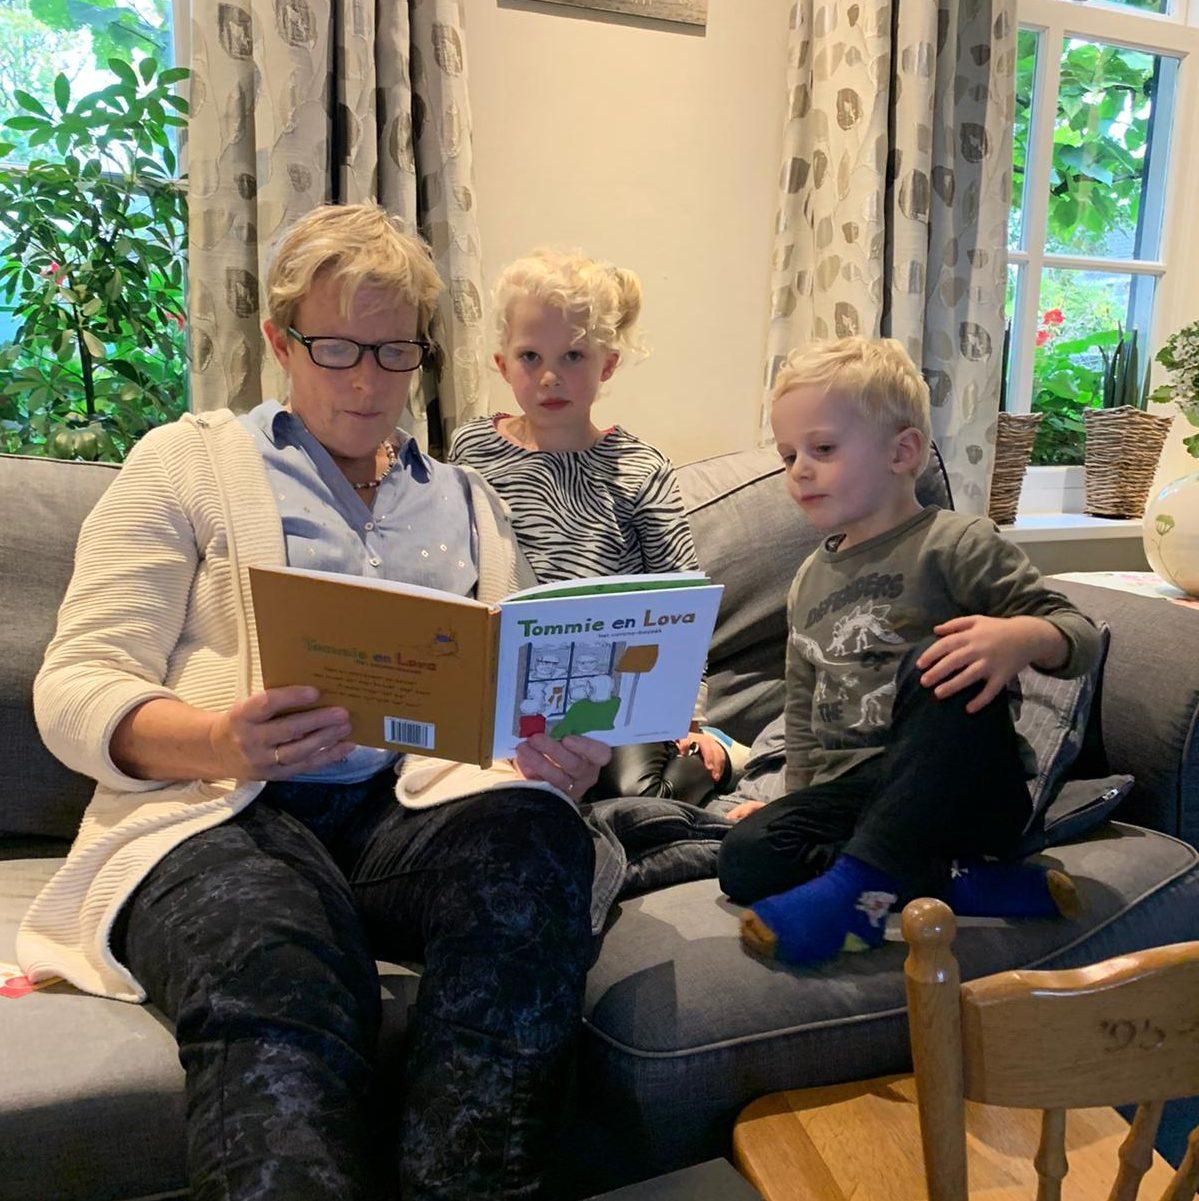 Oma Jeanne uit Oostelbeers leest voor uit Tommie en Lova, het coronabezoek aan kleinkinderen Mette (6) en Kars (3).